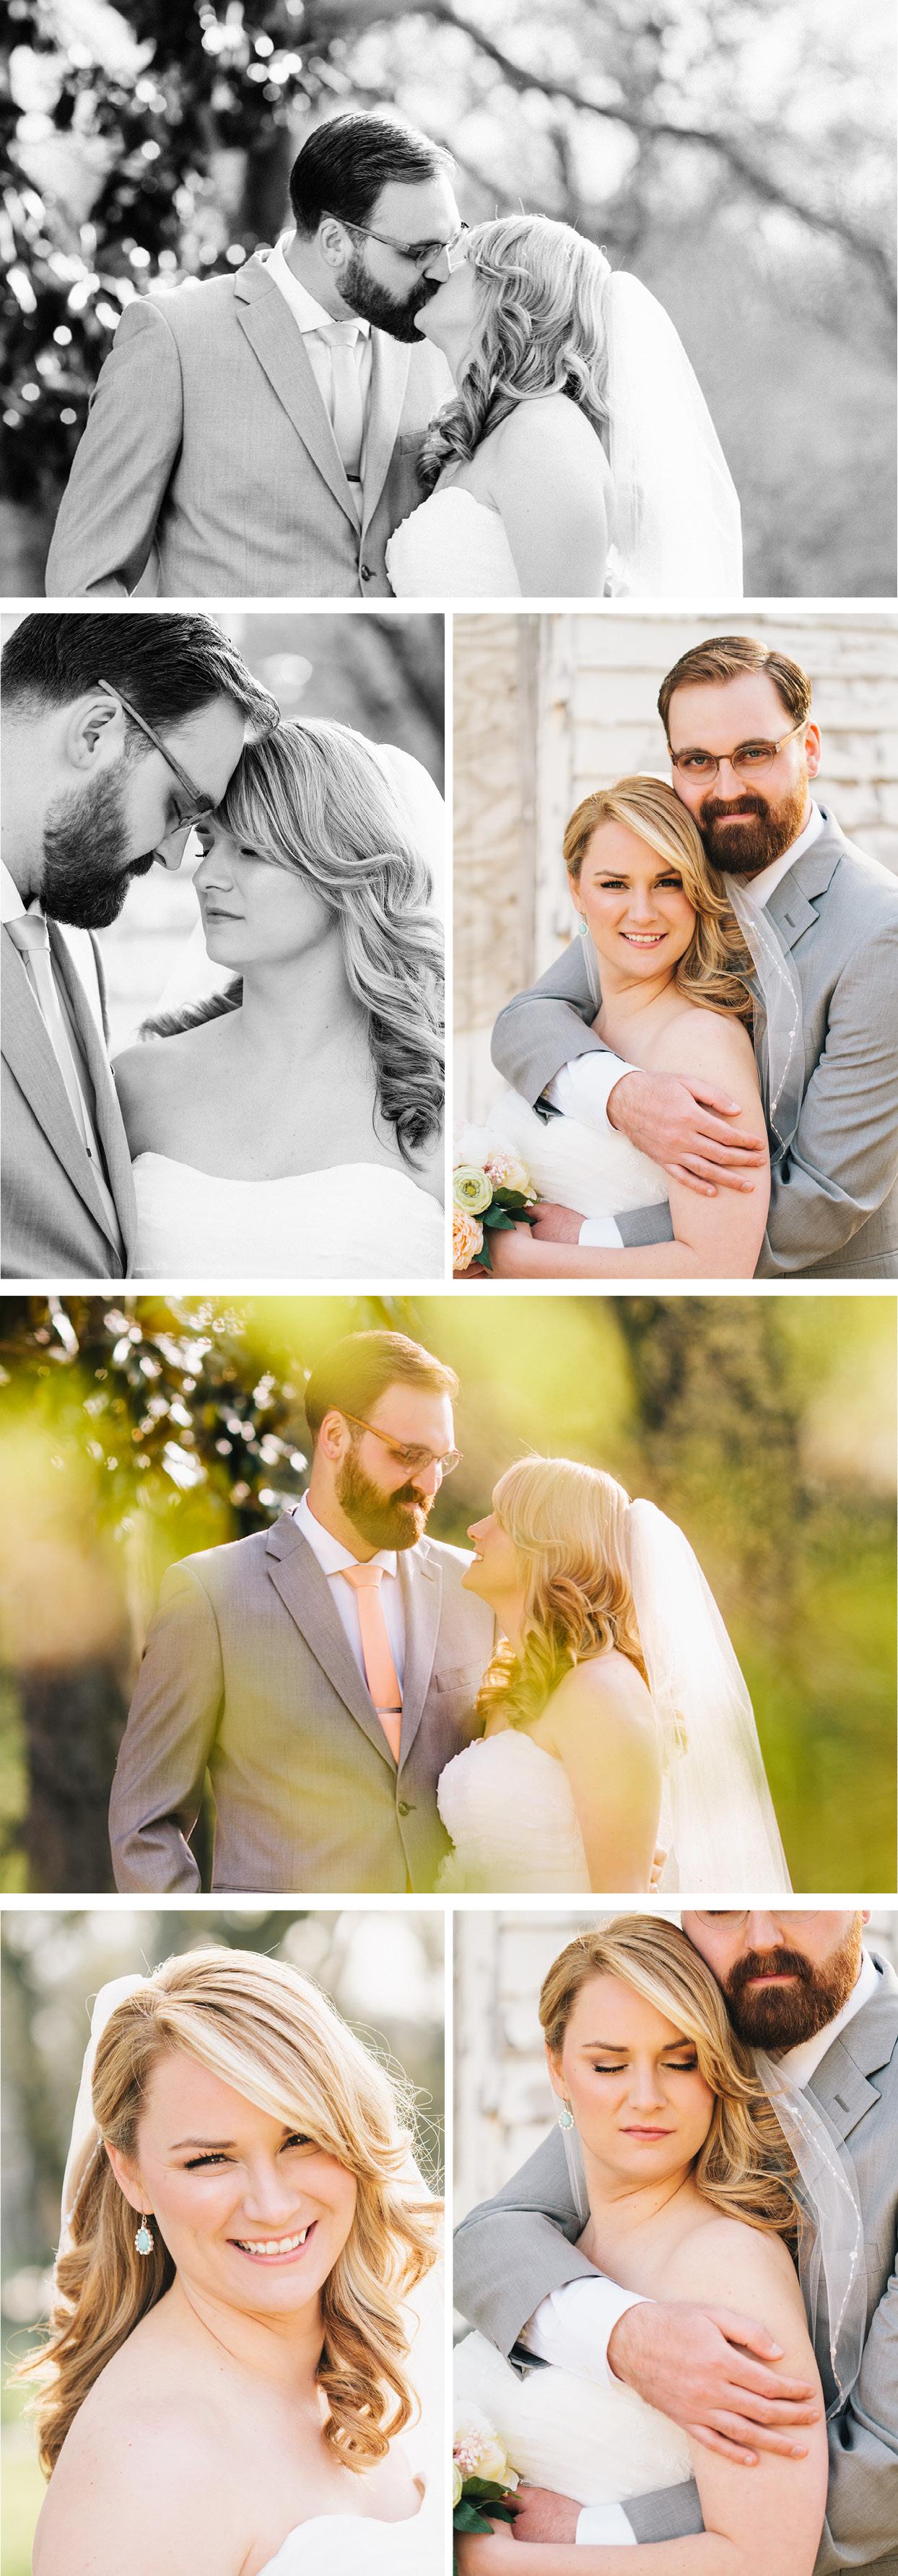 CK-Photo-Nashville-Wedding-Photographer-ST5.jpg